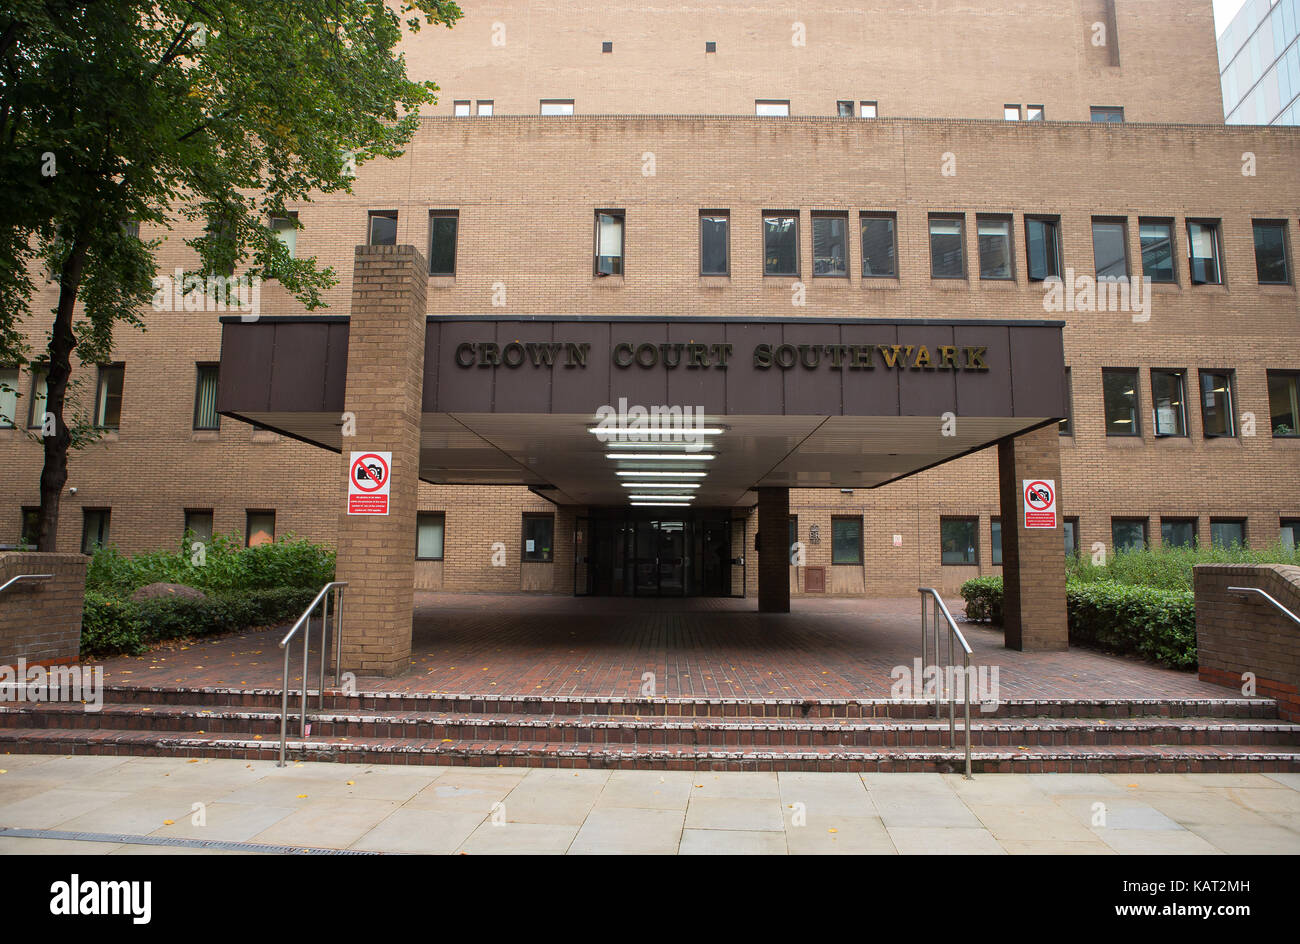 Southwark Crown Court General View GV, 1 English Grounds, London SE1 2HU - Stock Image